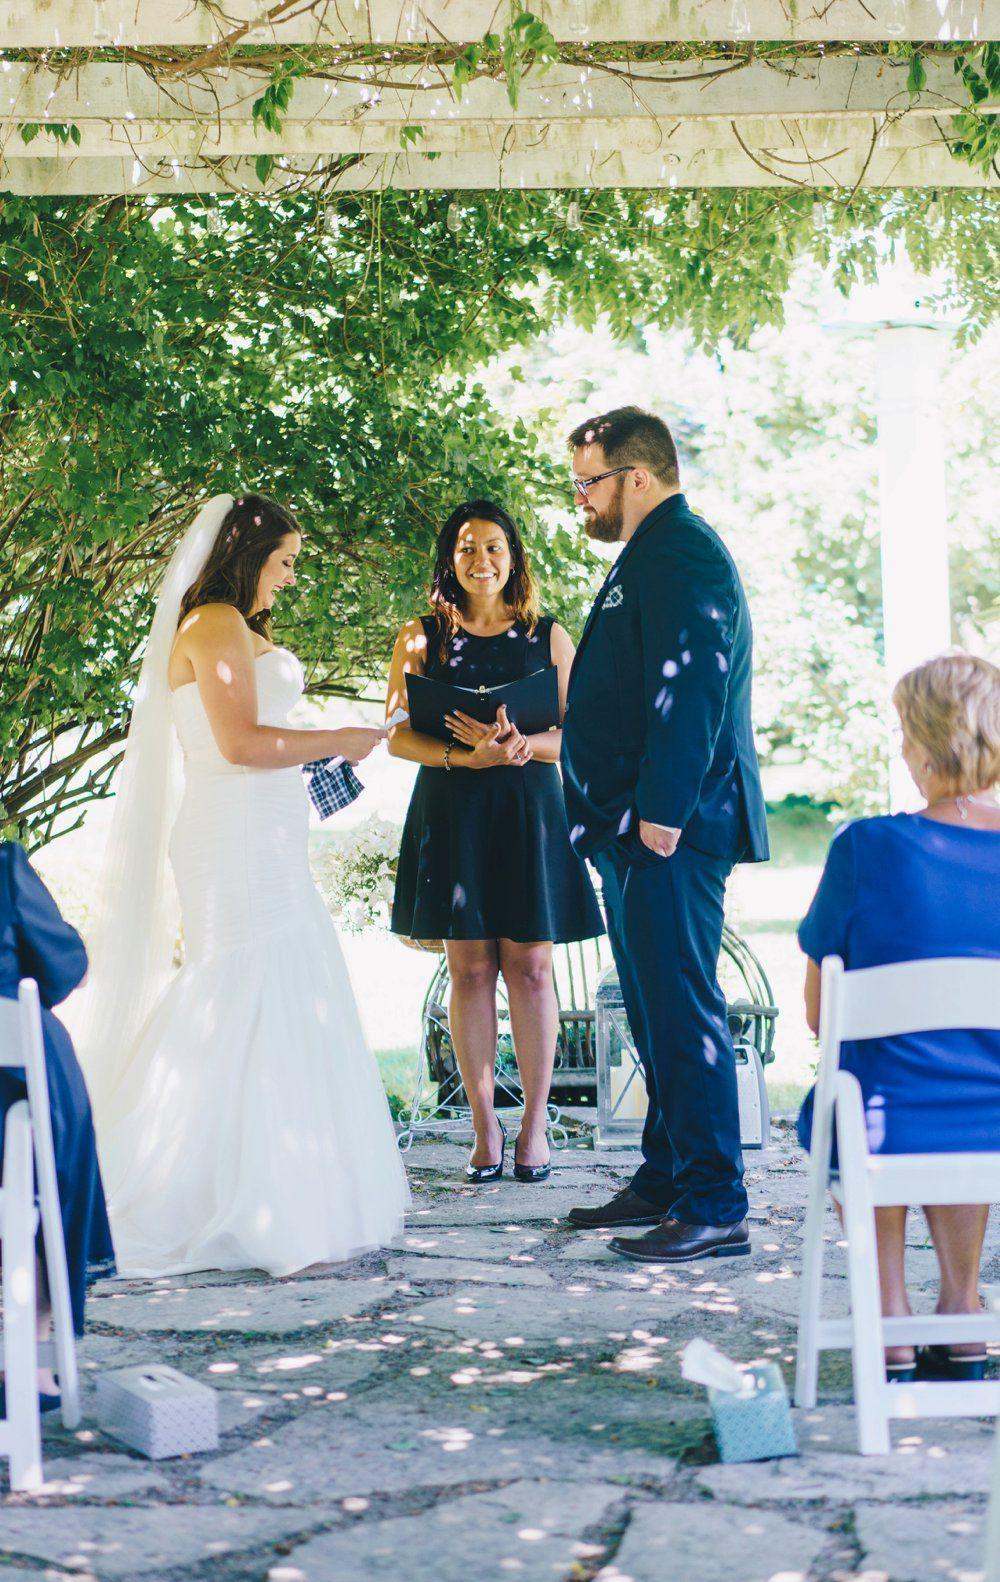 Lovely Little Elopement   Rental wedding dresses, Savvy bride ...